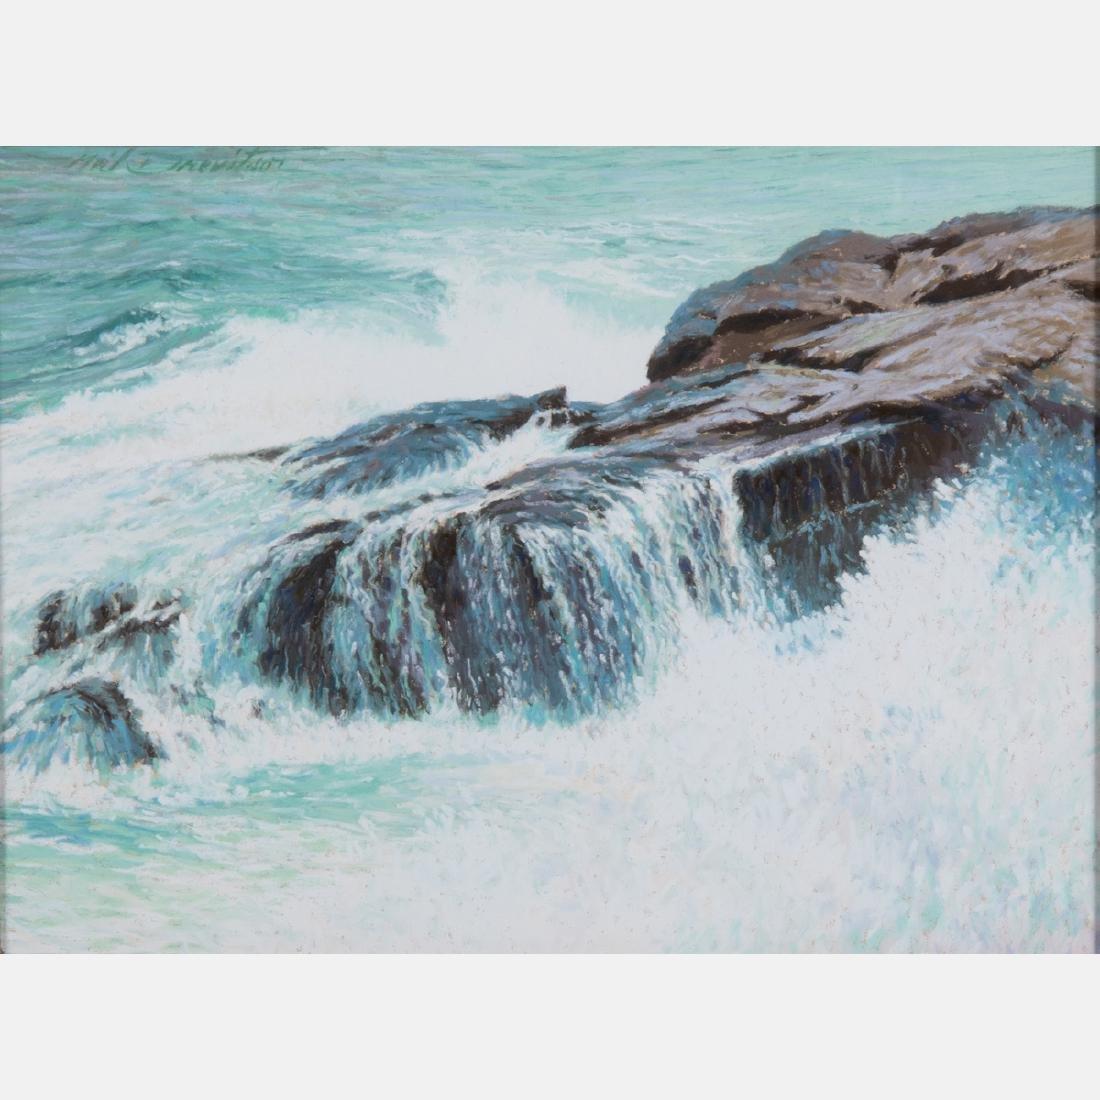 Neil Drevitson (American, b. 1944) Sea Ledge, Pastel,